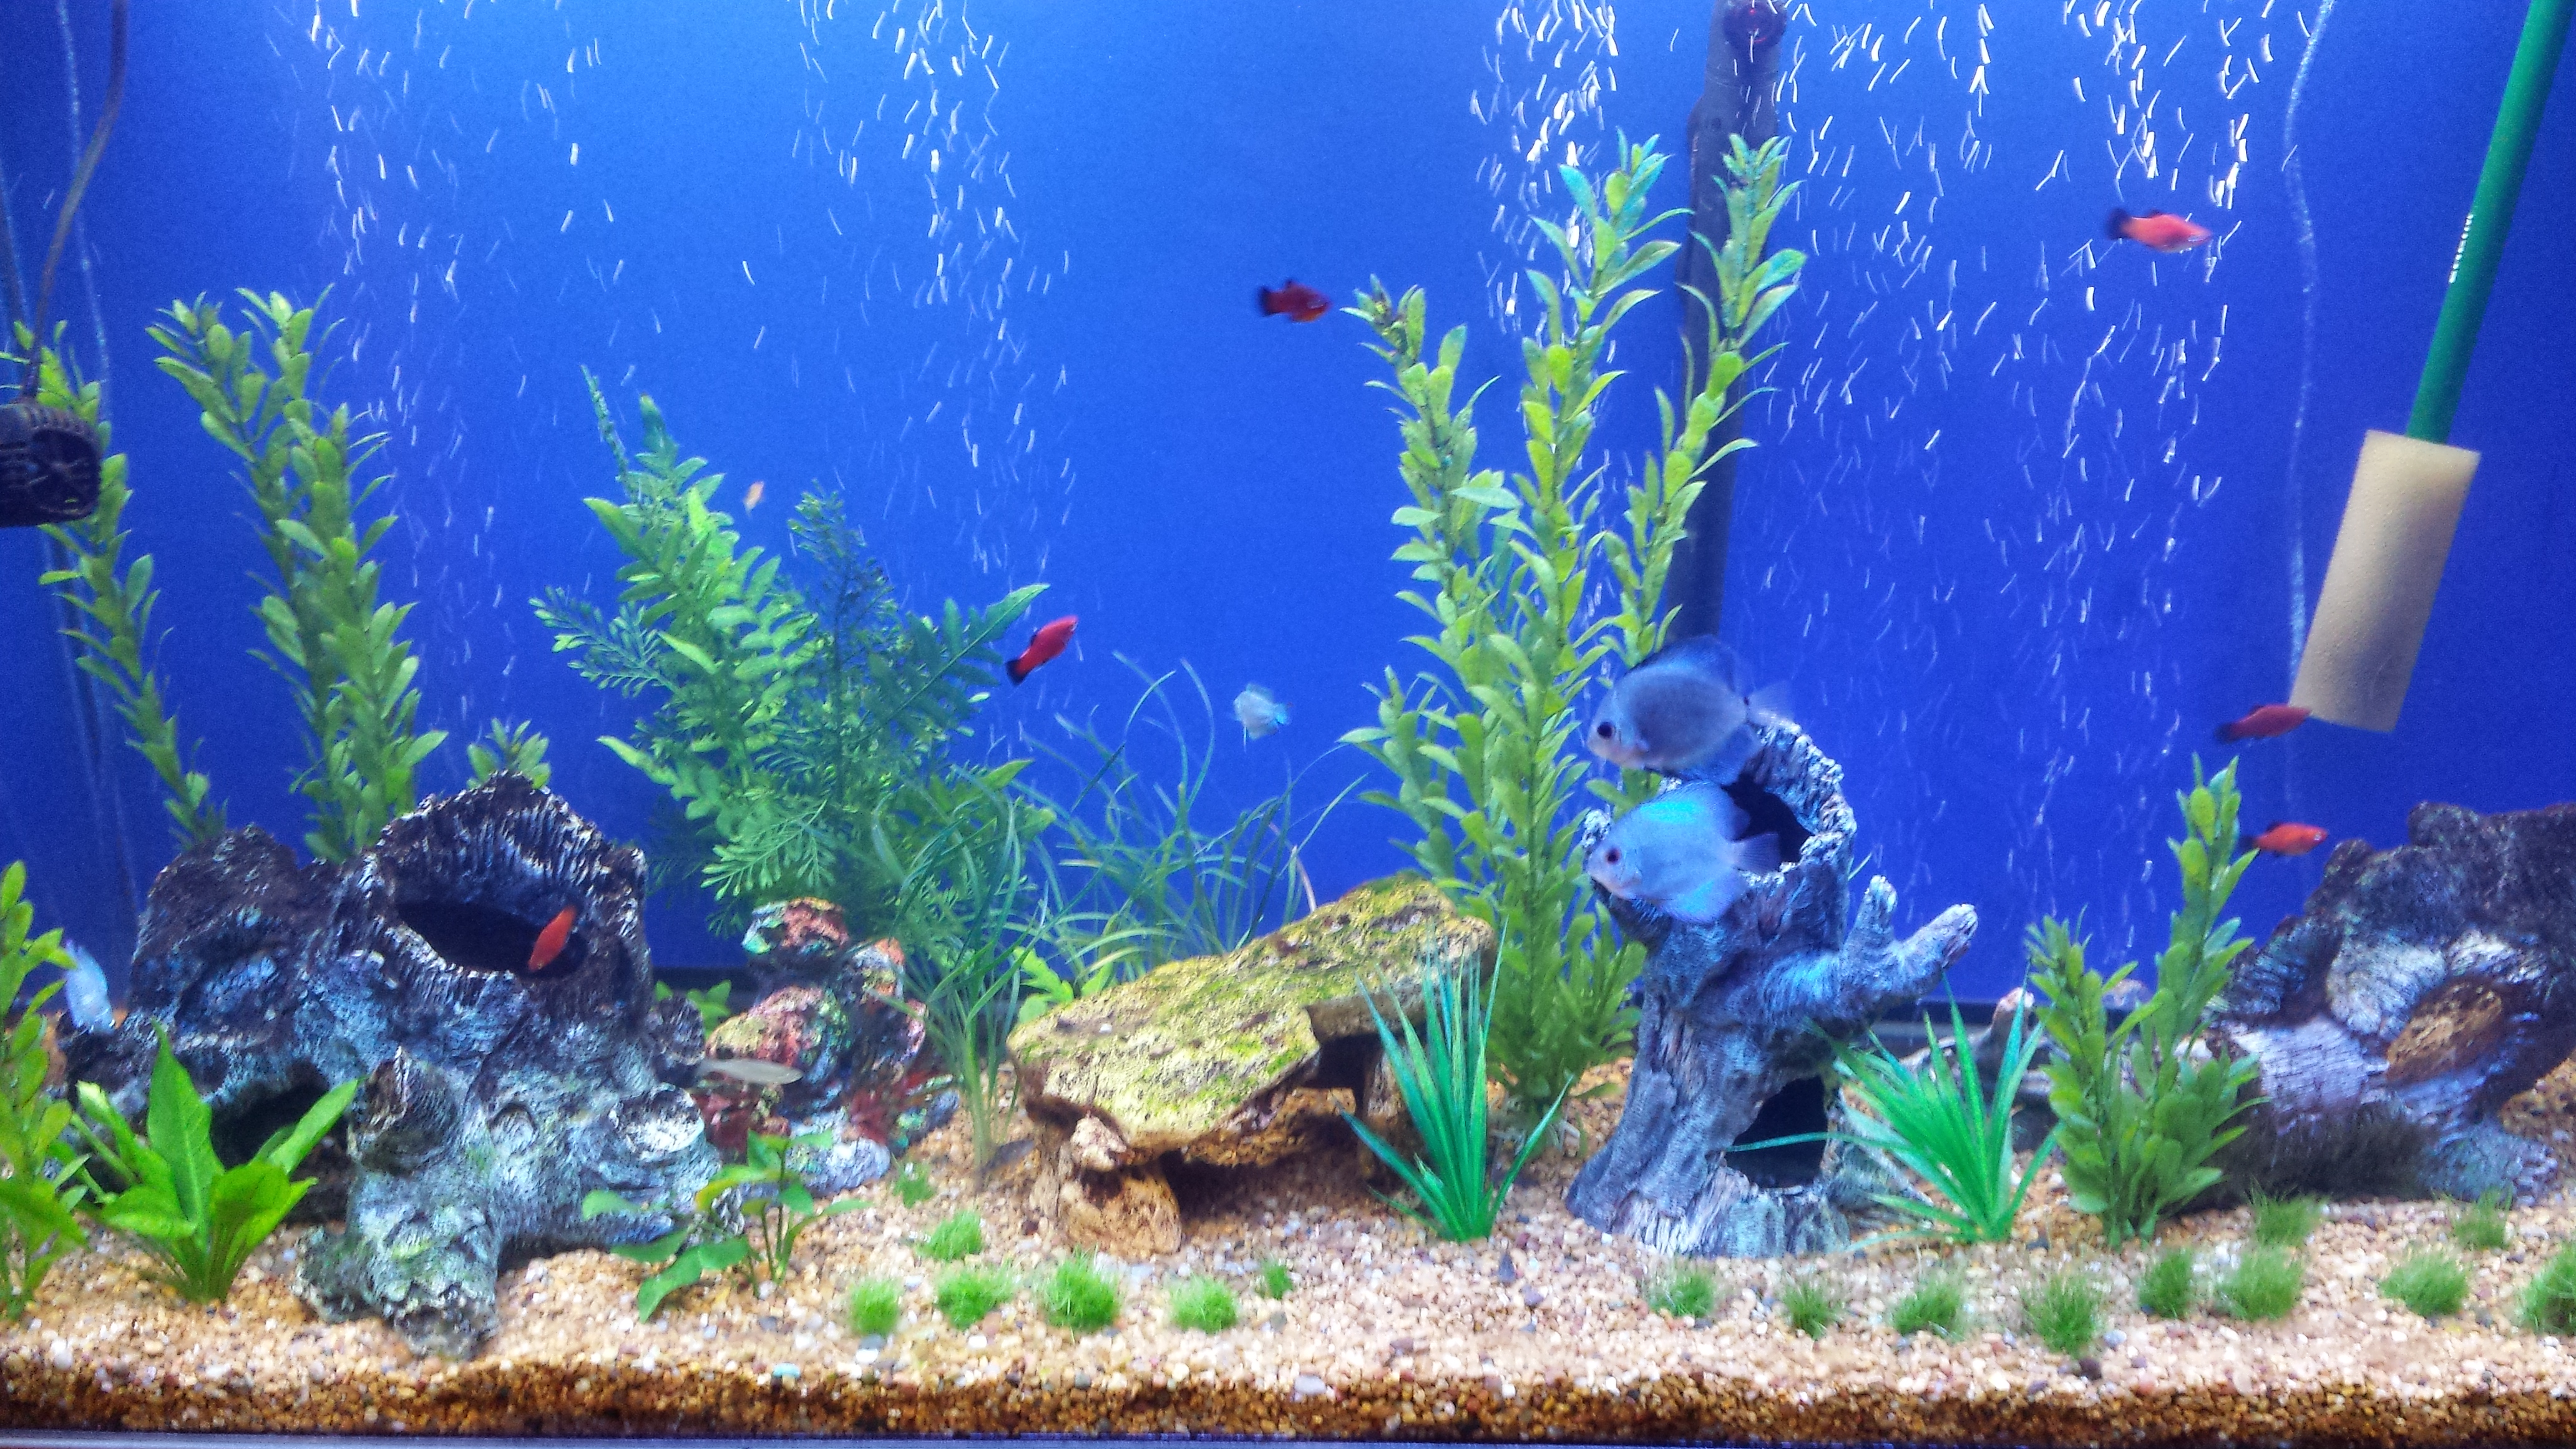 [48+] Fish Aquarium Wallpaper on WallpaperSafari  Printable Aquarium Background